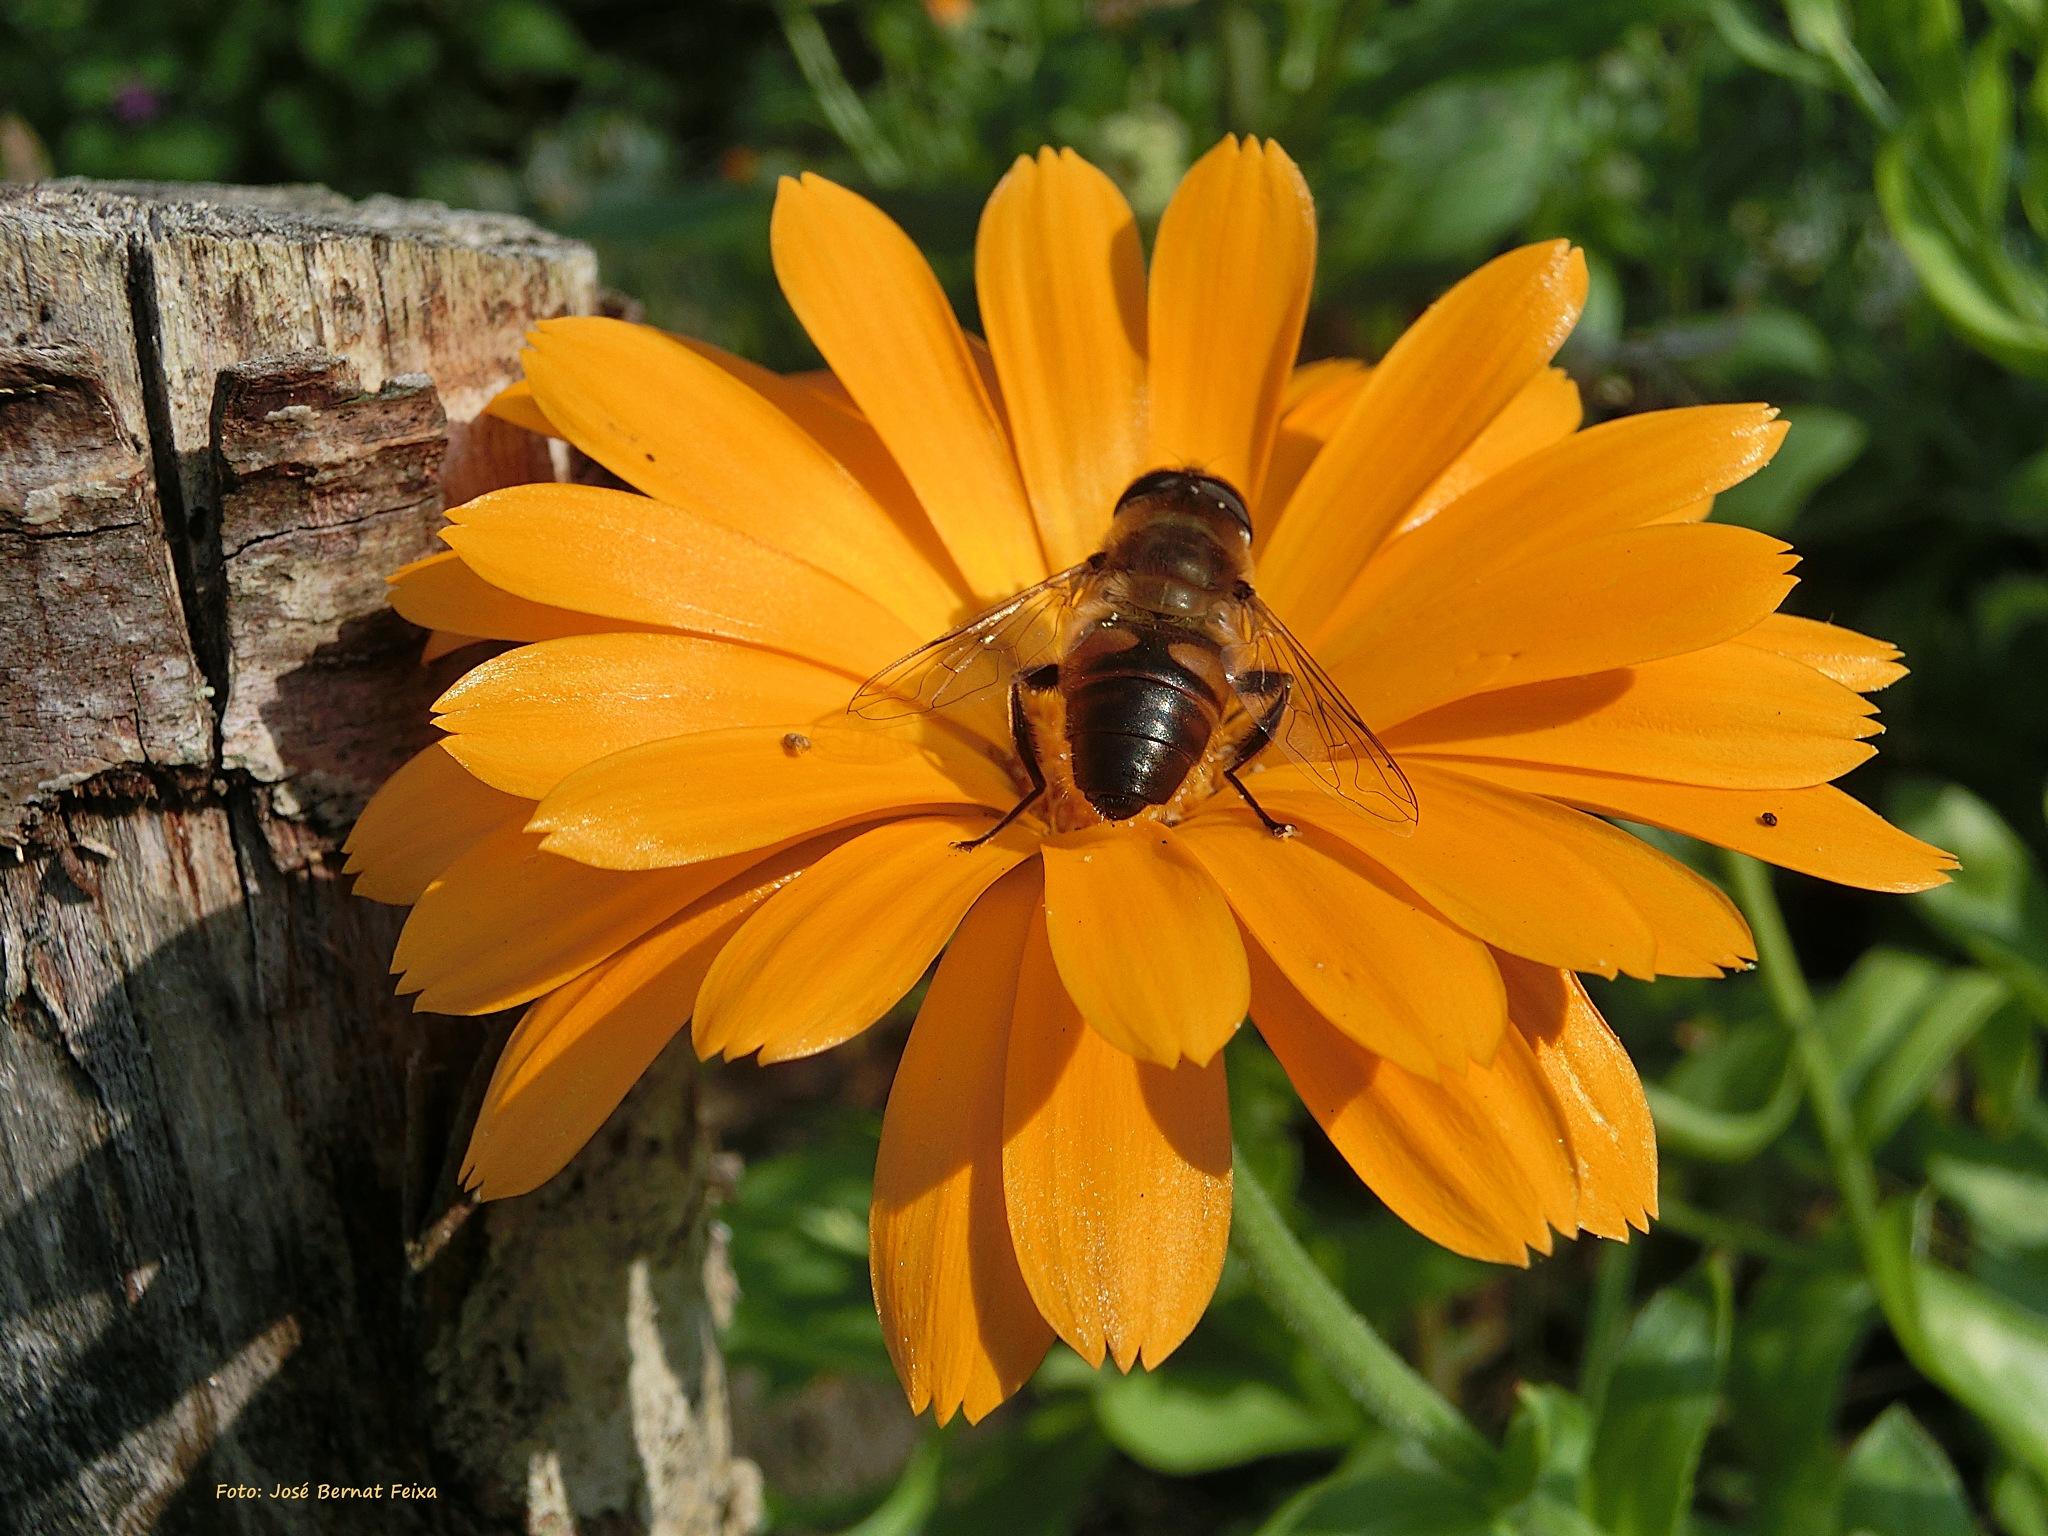 FLOR Y ABEJA; BLOEM EN BIJ; FLOWER AND BEE by José Bernat Feixa